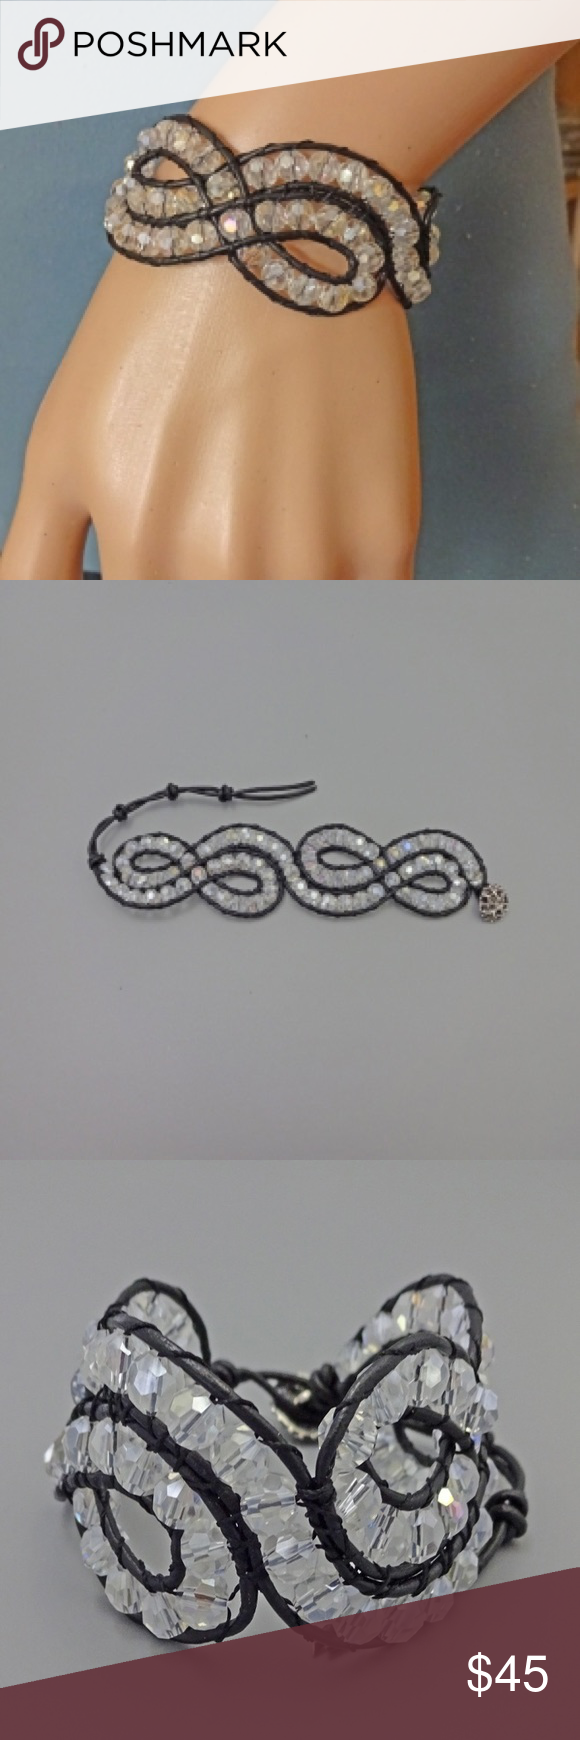 Beautiful handmade bracelet from crystals! Beautiful handmade bracelet made on leather with crystals ! Jewelry Bracelets